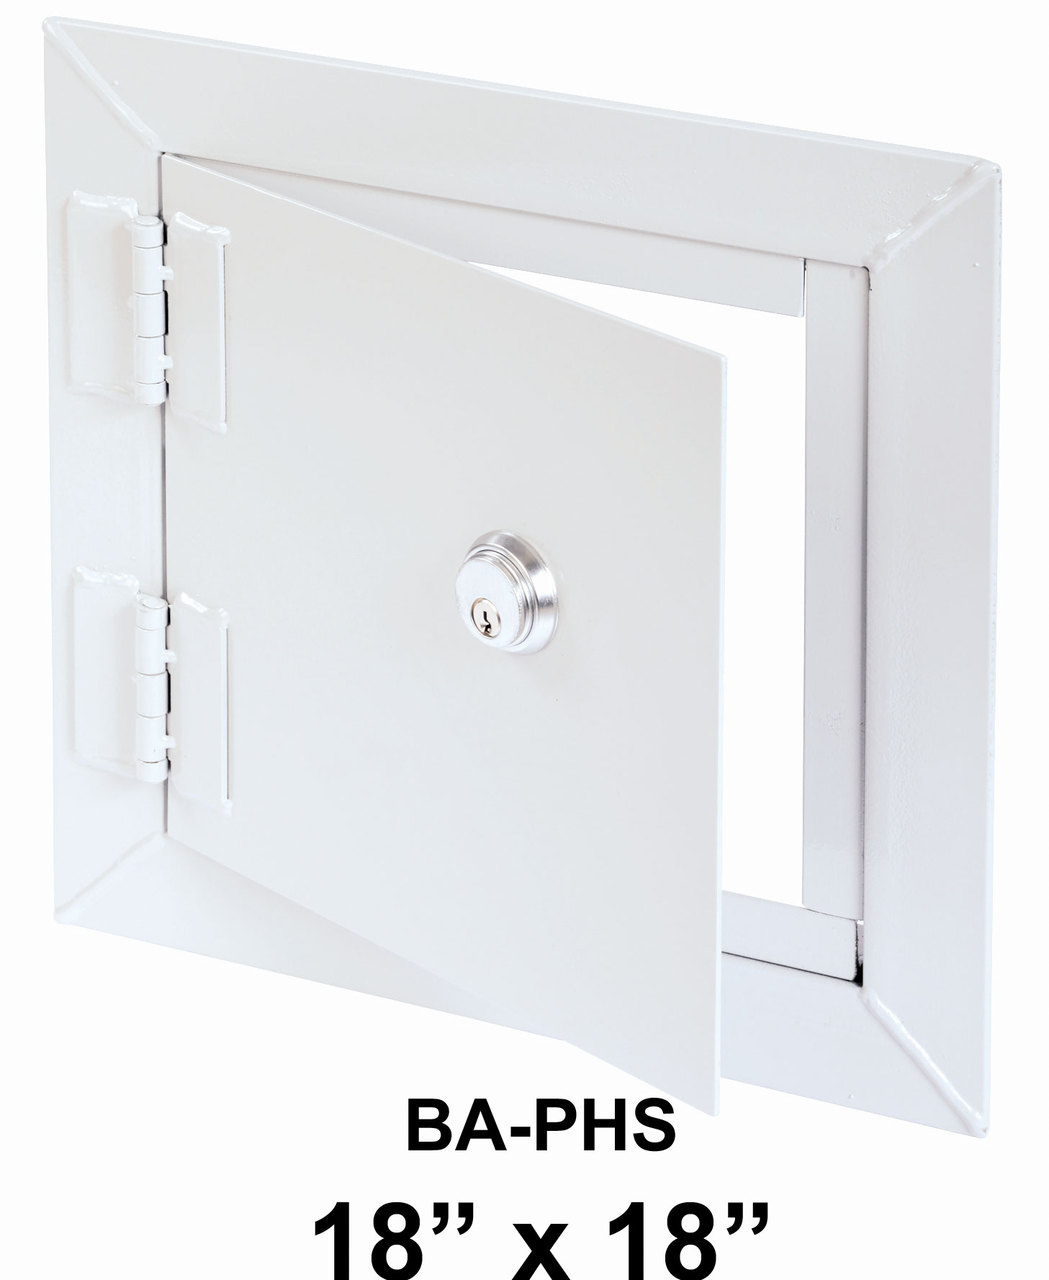 Access Doors 18 x 18 BA-PHS High Security Access - BEST